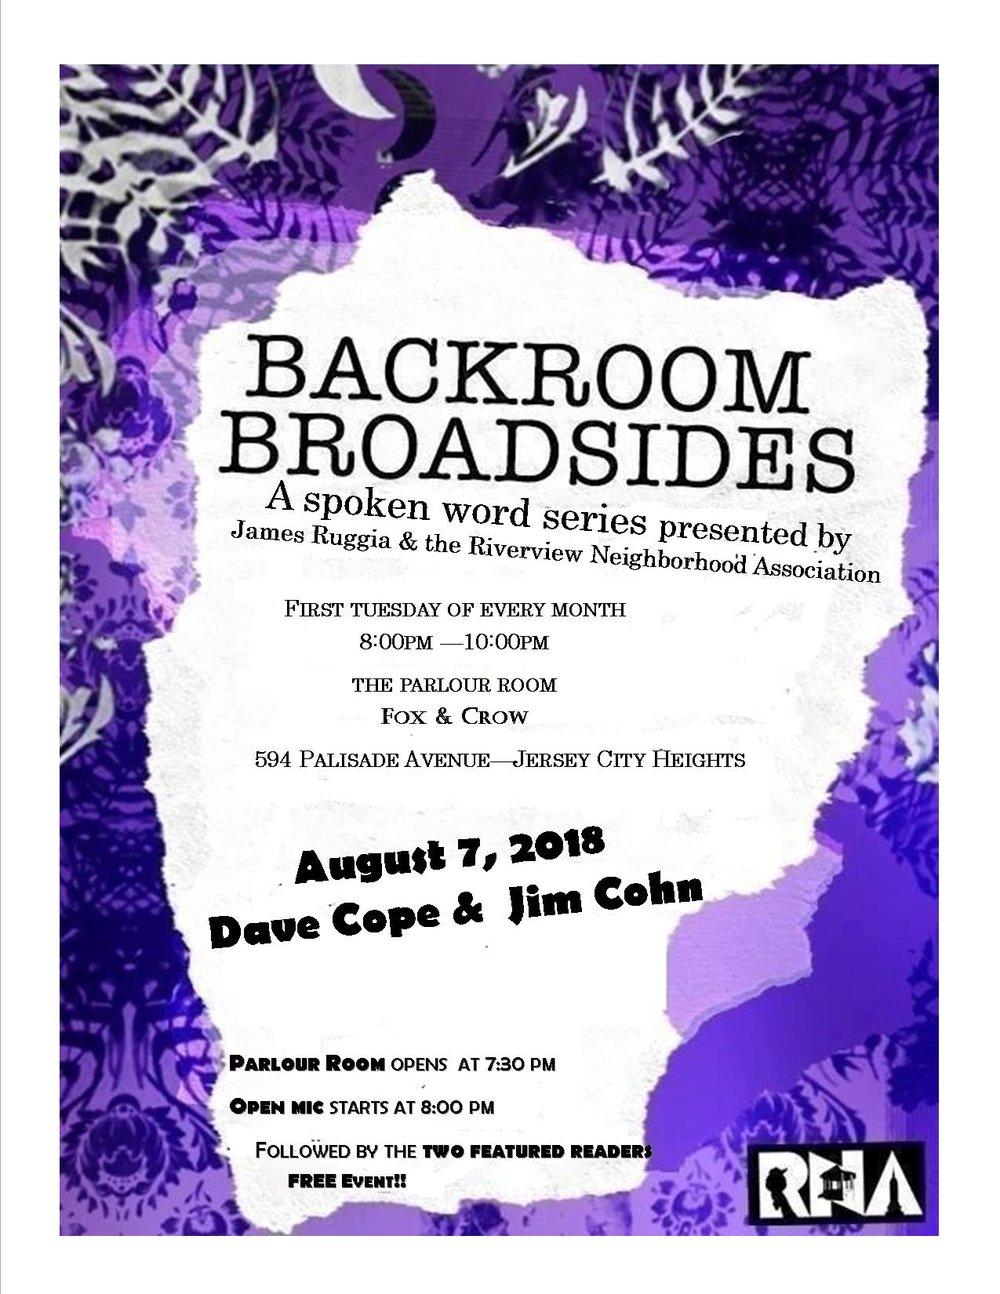 BackroomBroadsides_Poster_Aug_18_Cohn_Cope.jpg